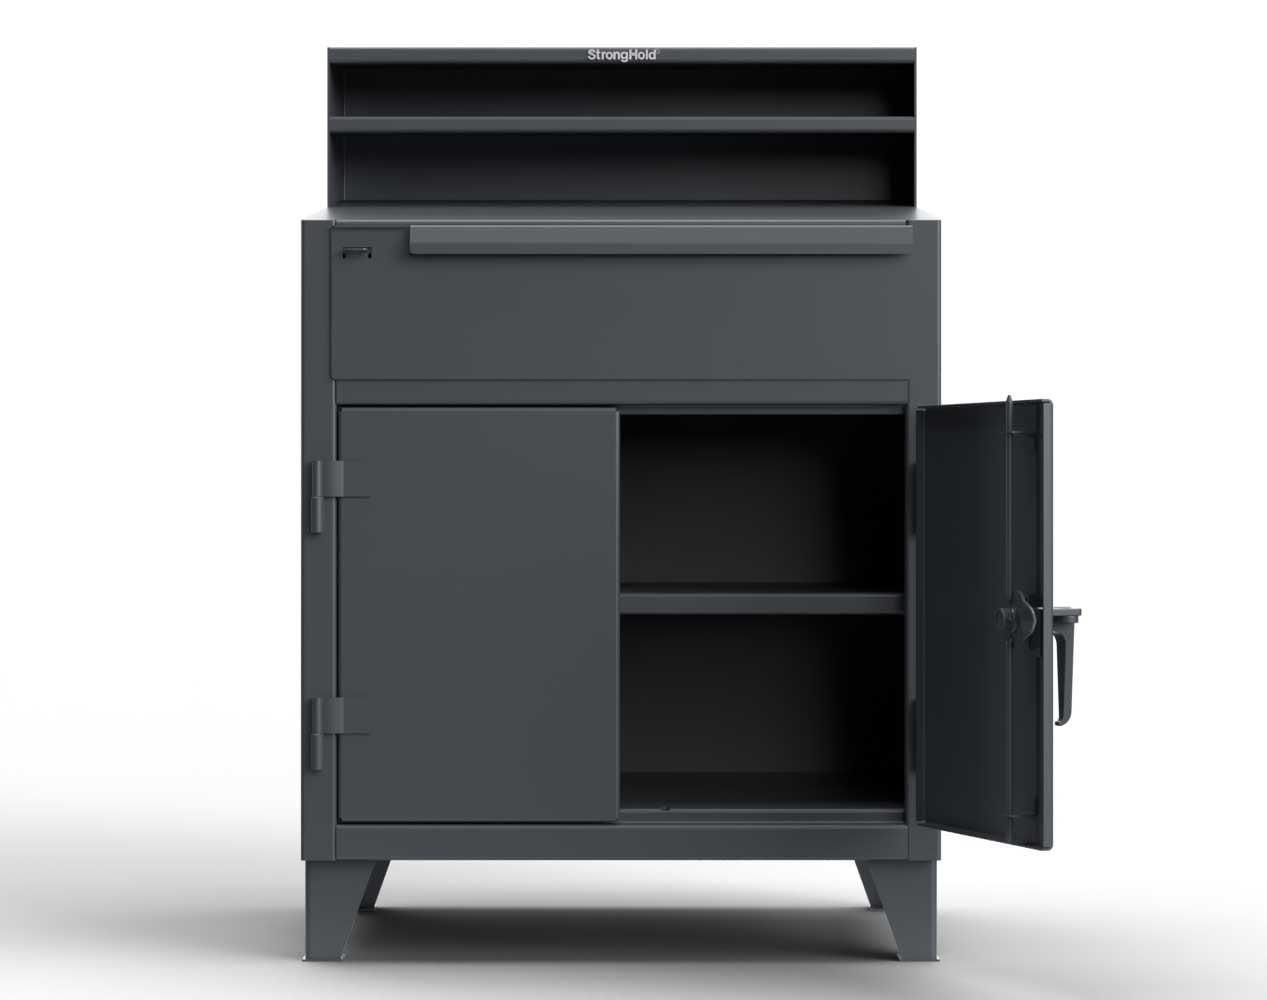 Extra Heavy Duty 12 GA Shop Desk with 1 Drawer, 1 Shelf, Riser Shelf  – 36 In. W x 28 In. D x 54 In. H